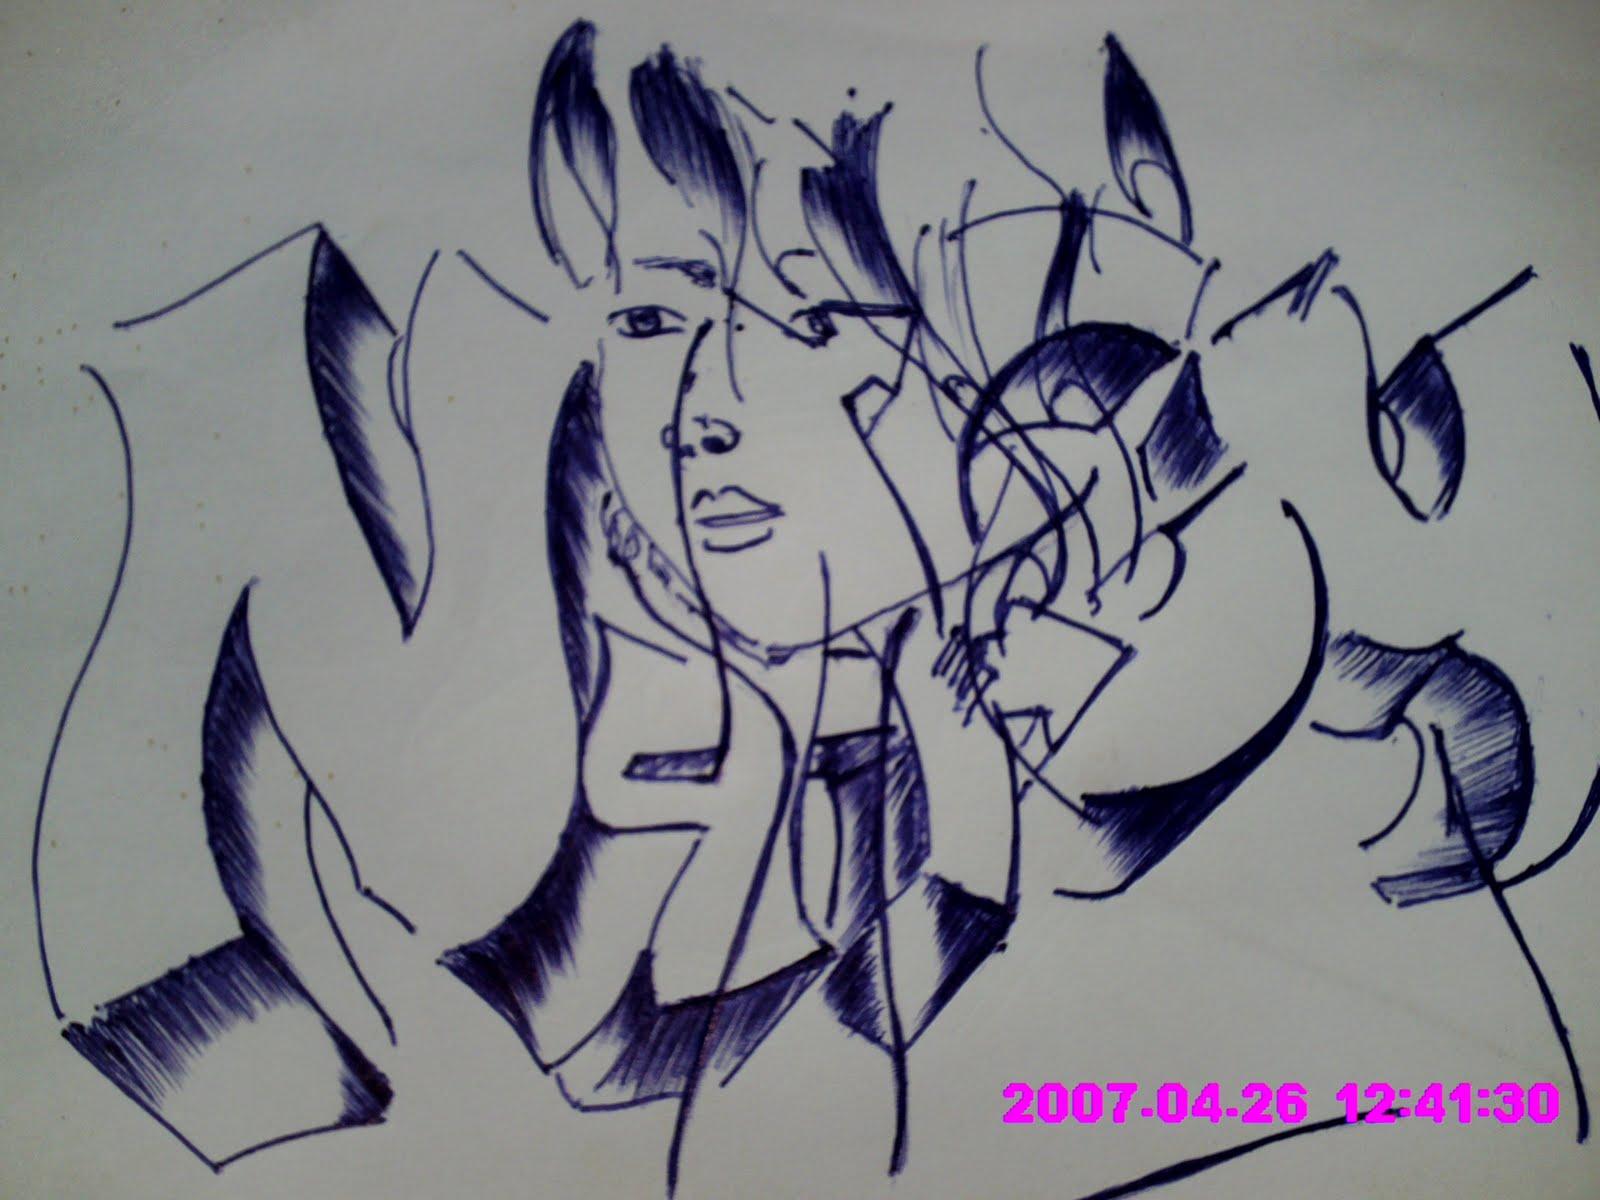 Diego Letras De Graffiti Abecedario Alphabet